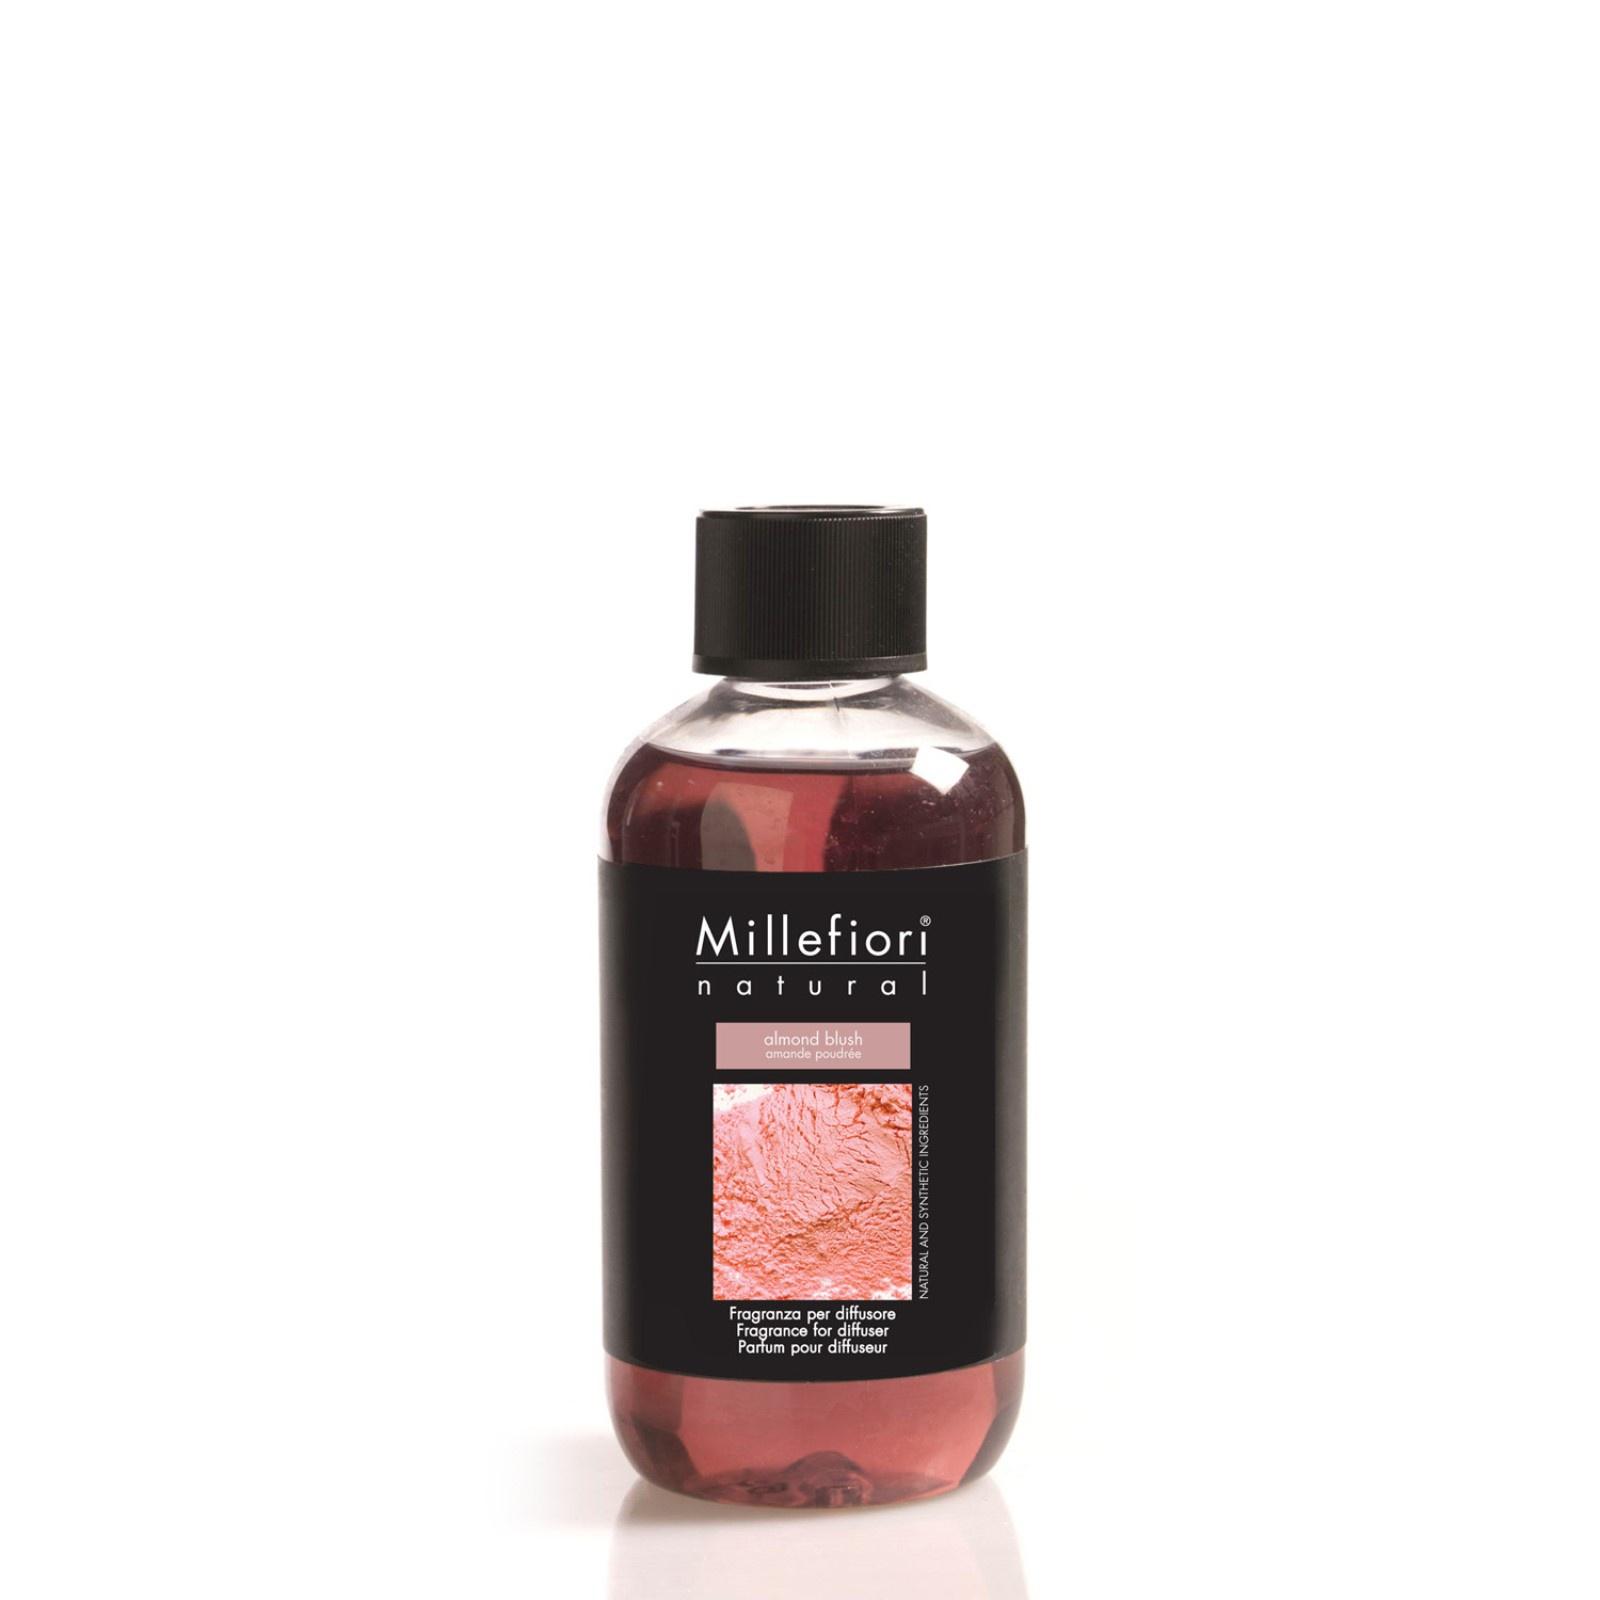 NATURAL / Сменный блок (рефилл) 250 мл. Оттенки миндаля / Almond blush